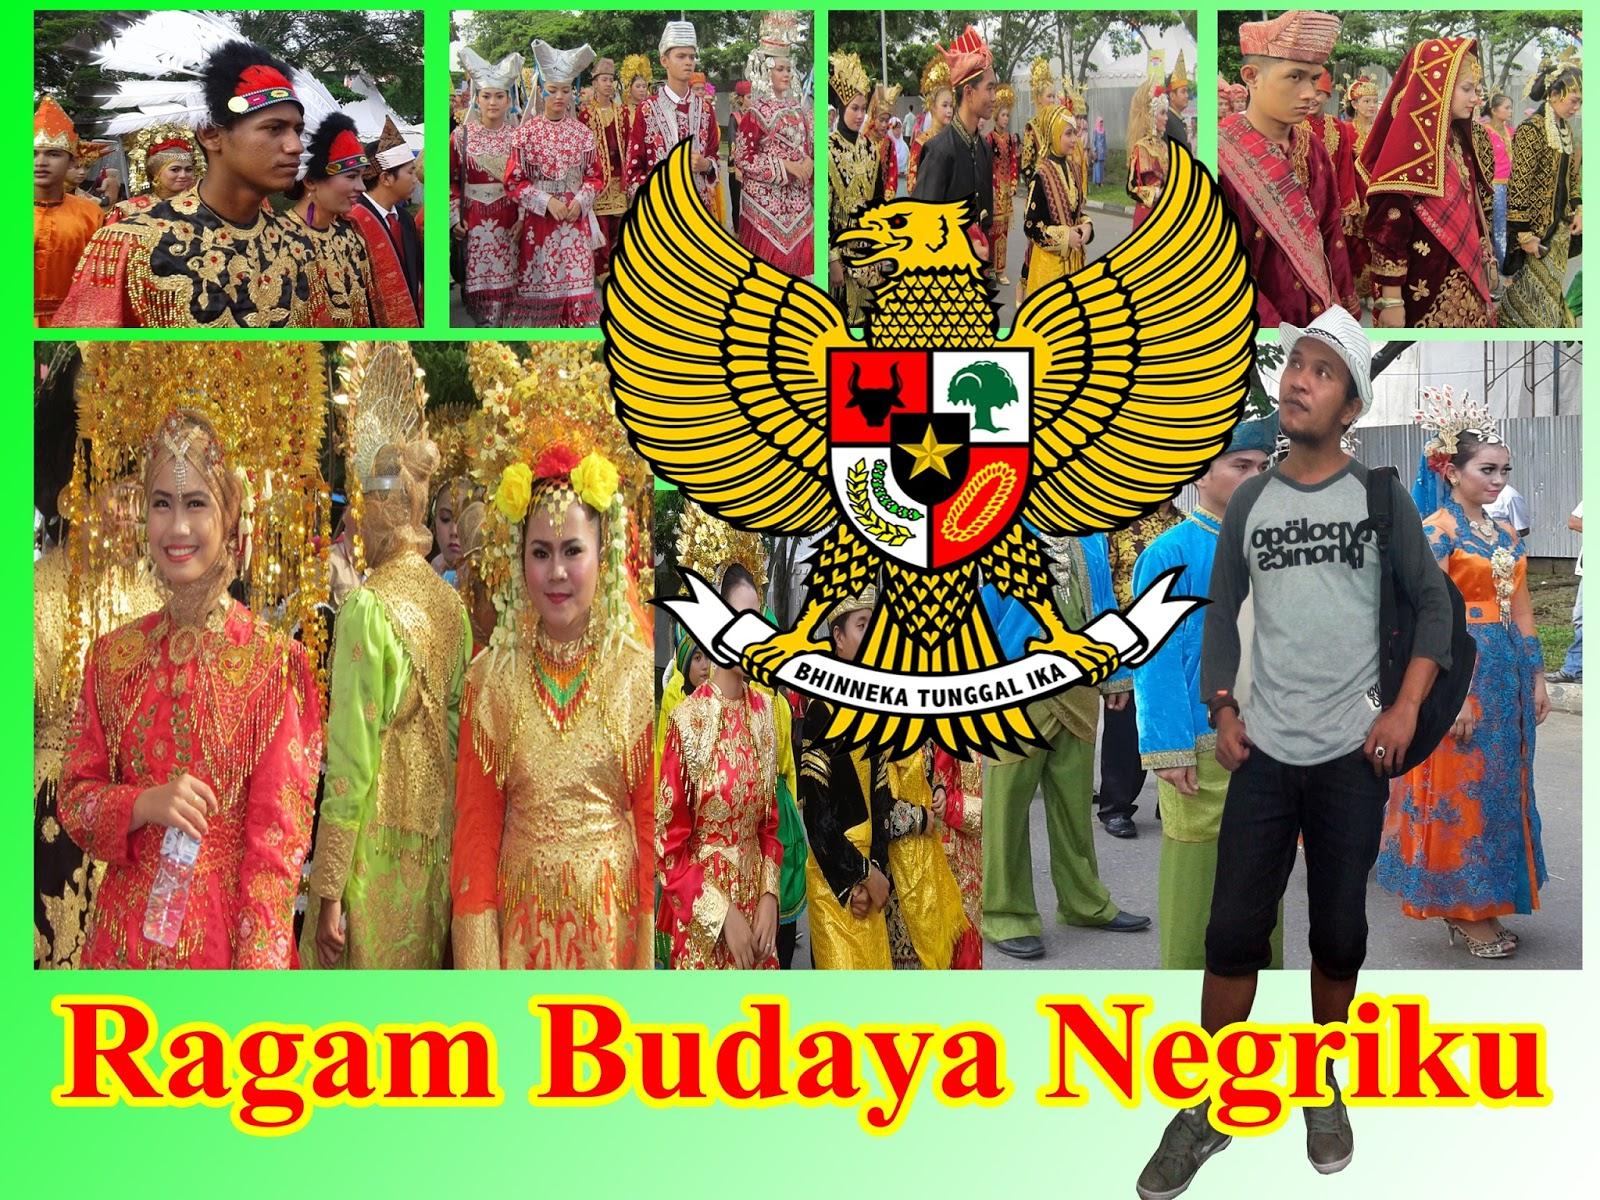 Ragam Budaya Negeri Ku Indonesia Q Beritakan